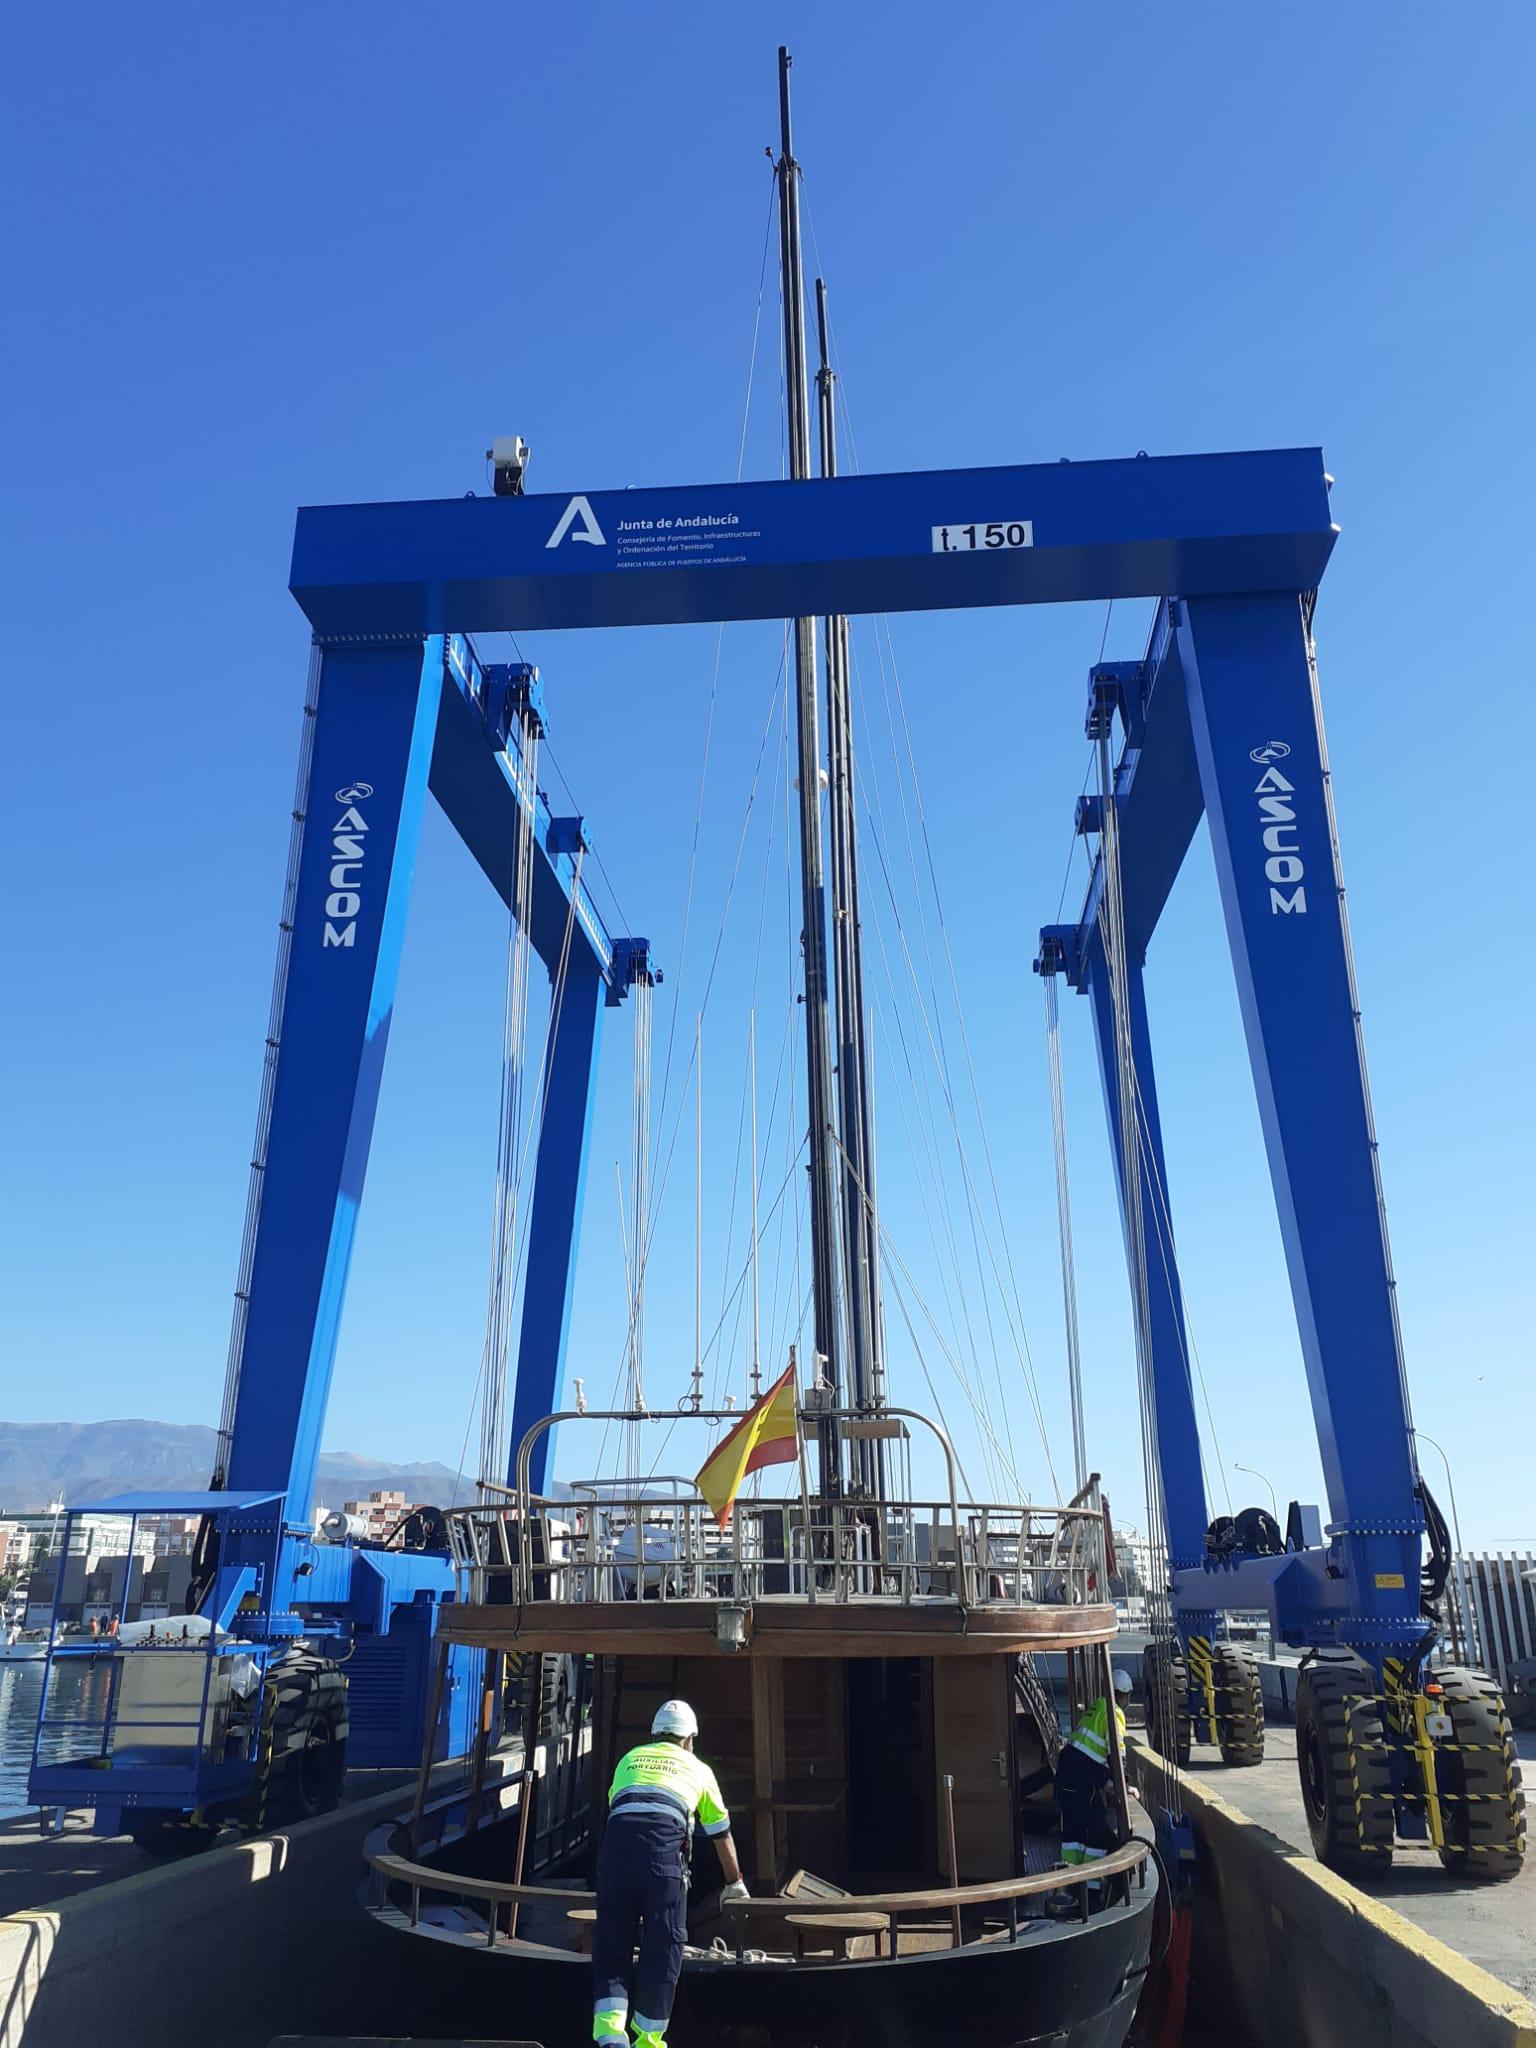 Imagen de portada de Puertos de Andalucía